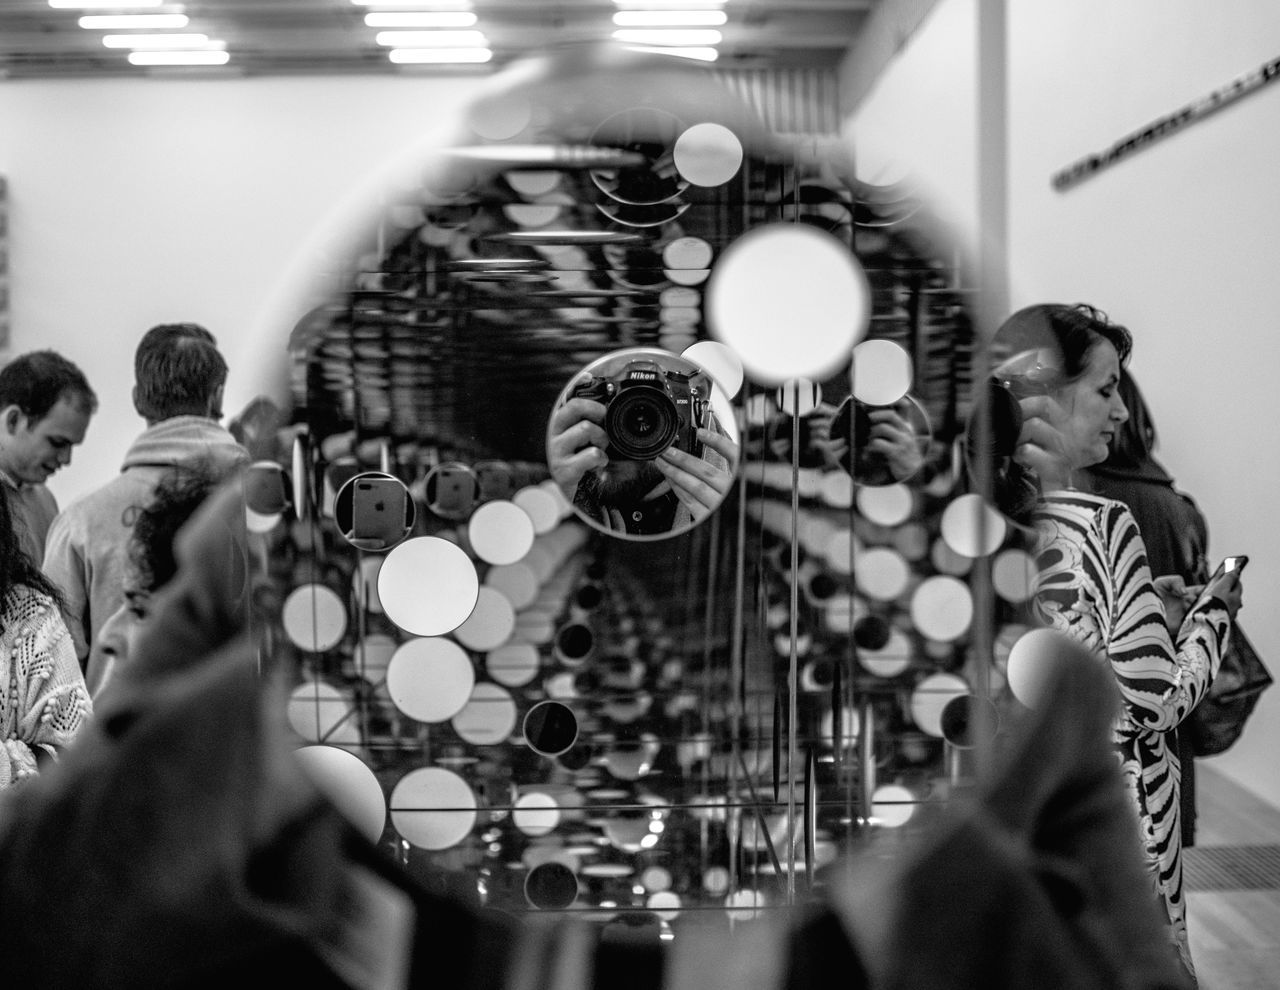 Selfie. Selfienation Self Portrait Selfie Portrait Self Portrait Experiments Adult Real People LONDON❤ London BYOPaper! Blackandwhitephotography Malephotographerofthemonth Art Is Everywhere Frame Within A Frame The Portraitist - 2017 EyeEm Awards